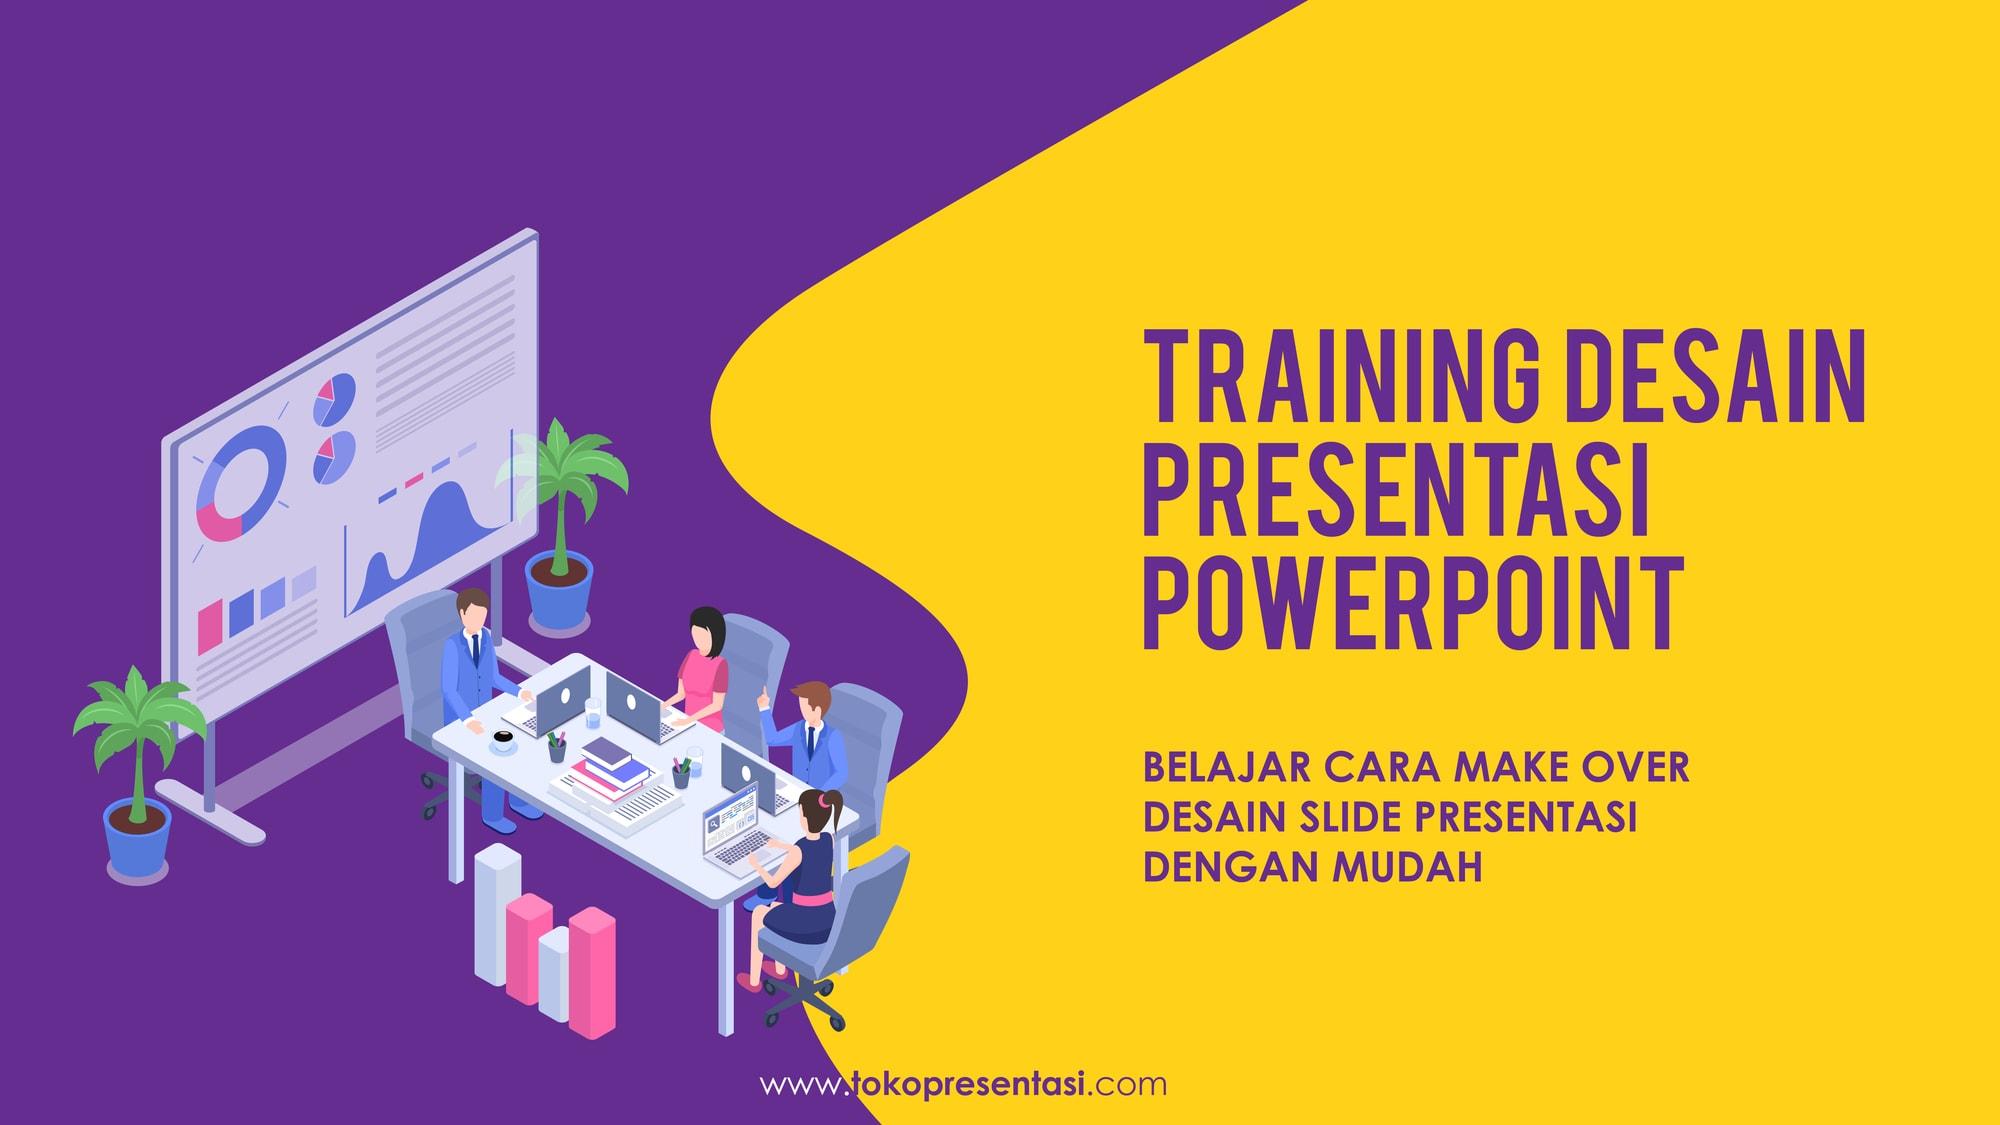 Pelatihan Desain Presentasi PowerPoint Komisi Nasional Hak Asasi Manusia Tokopresentasi